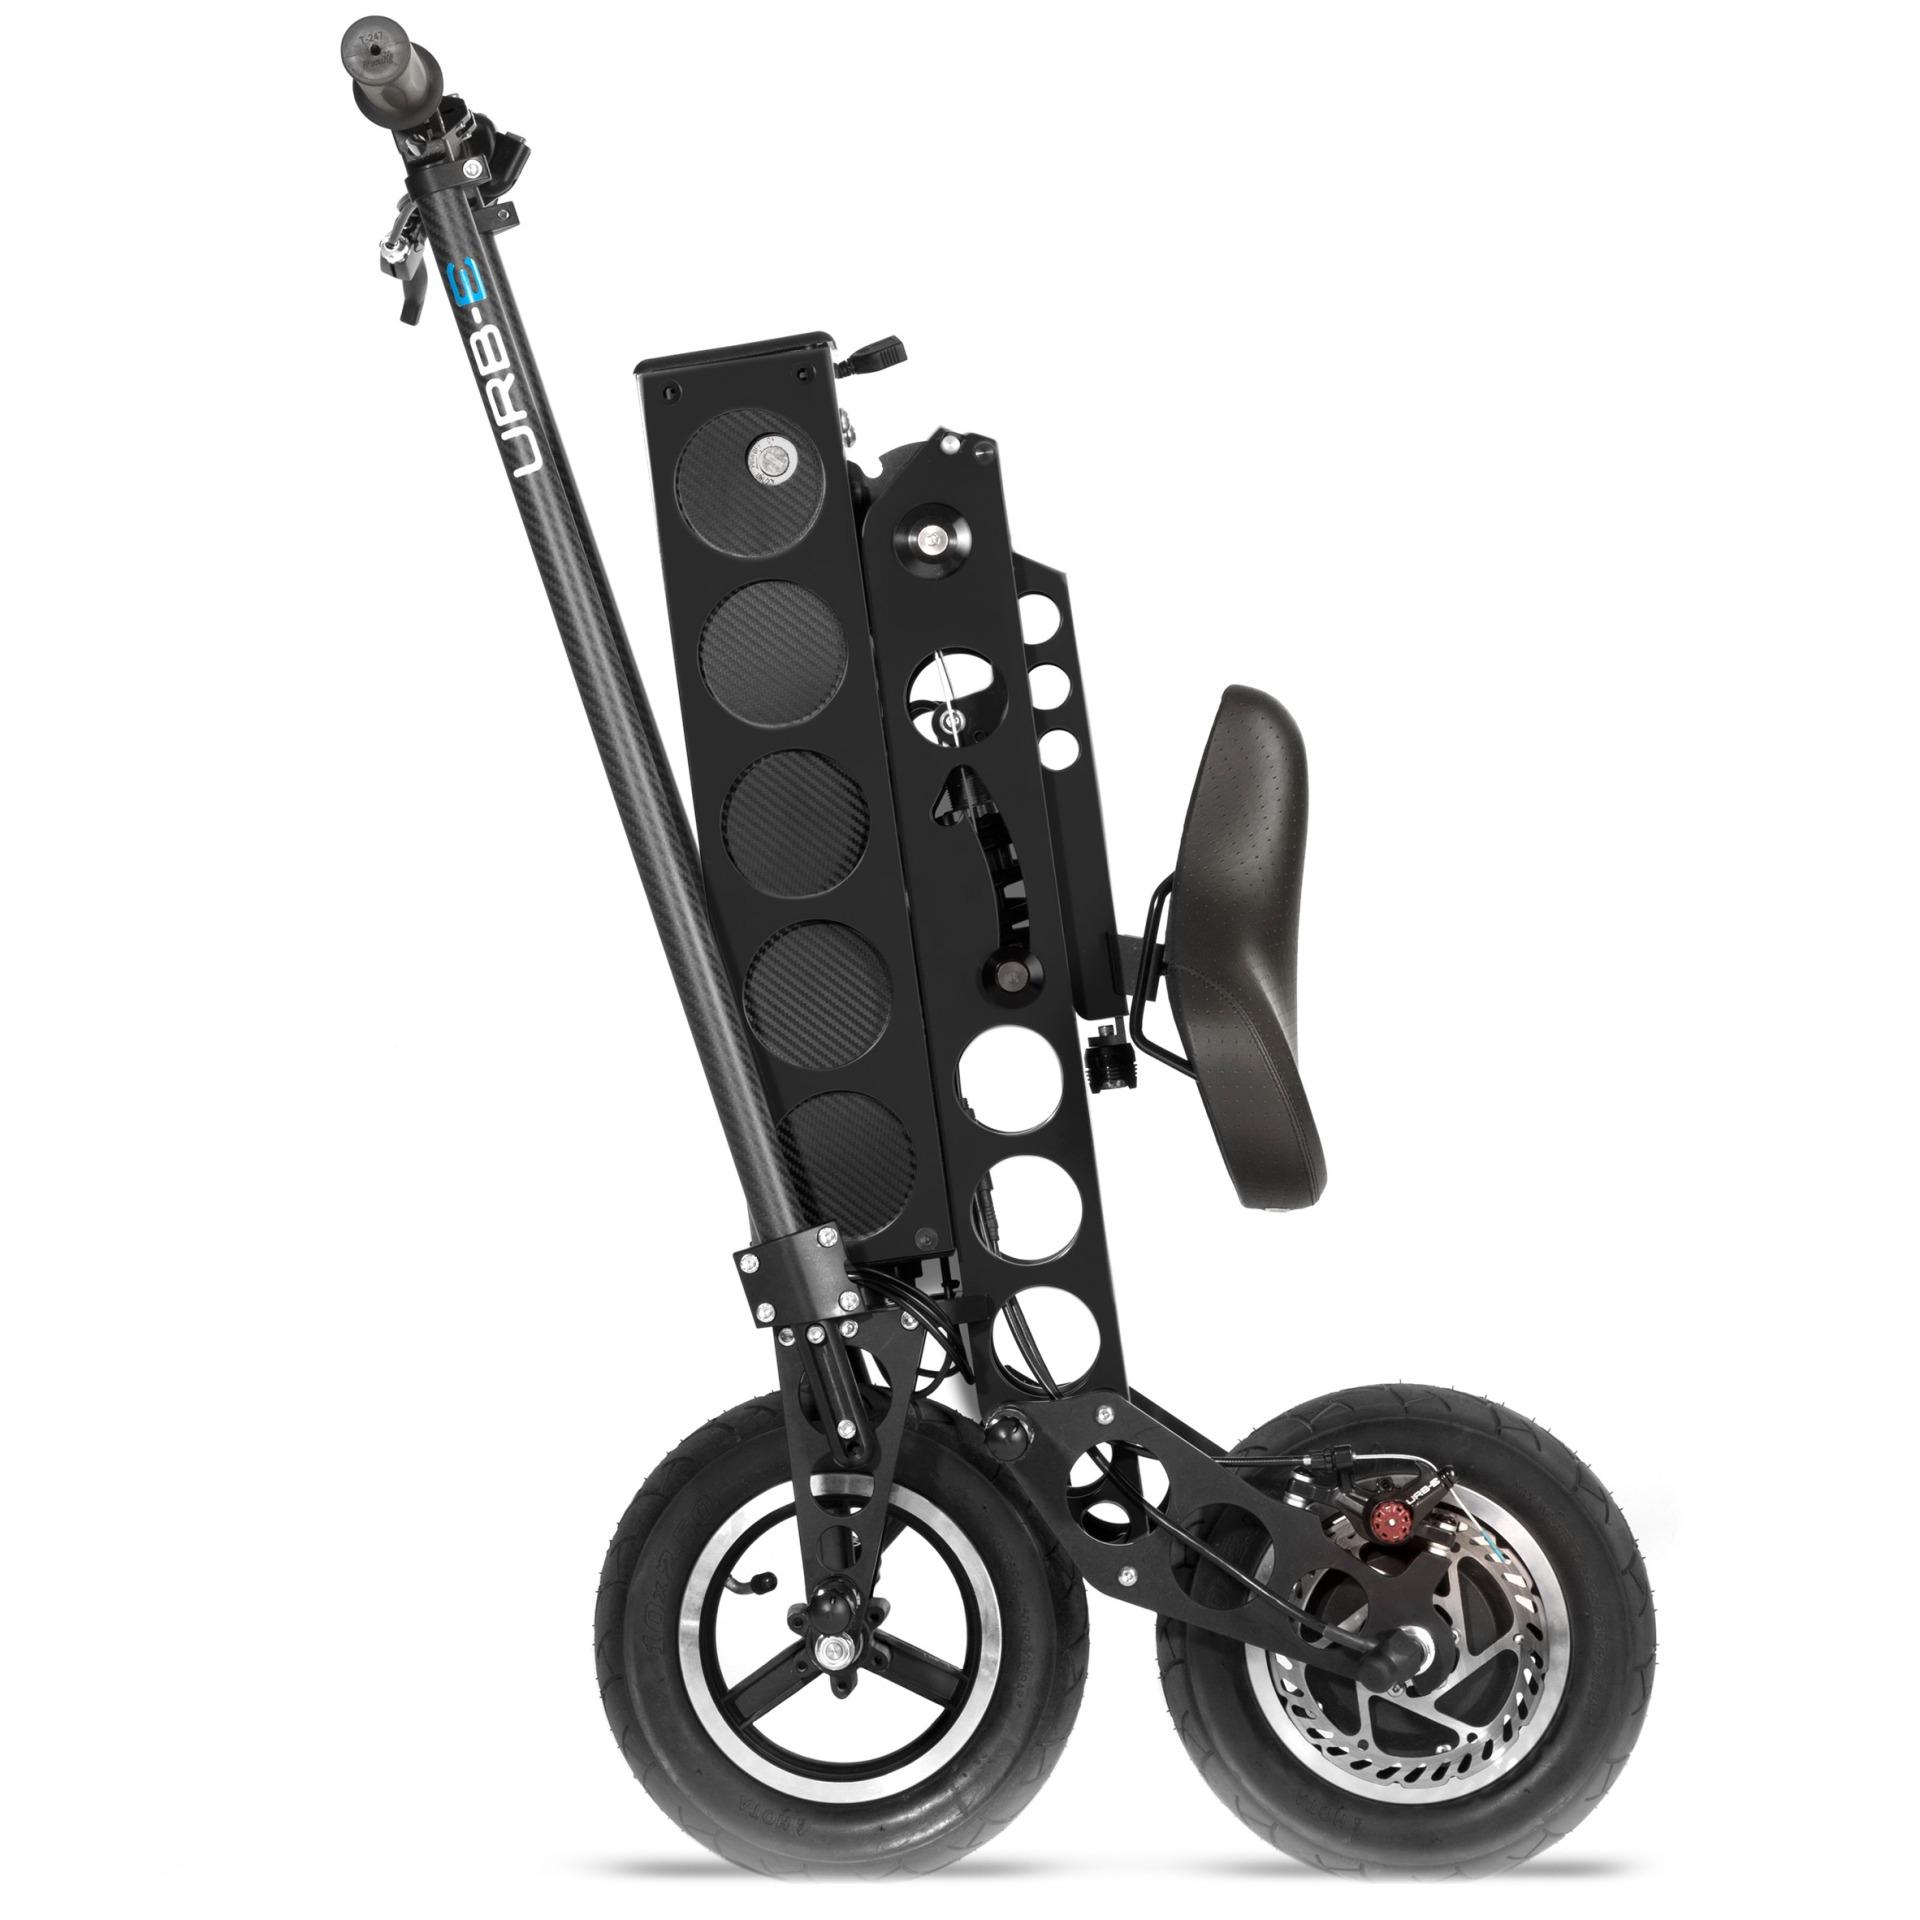 urb-pro-e-scooter-design-transport-electric-vehicles-ces_dezeen_2364_col_11